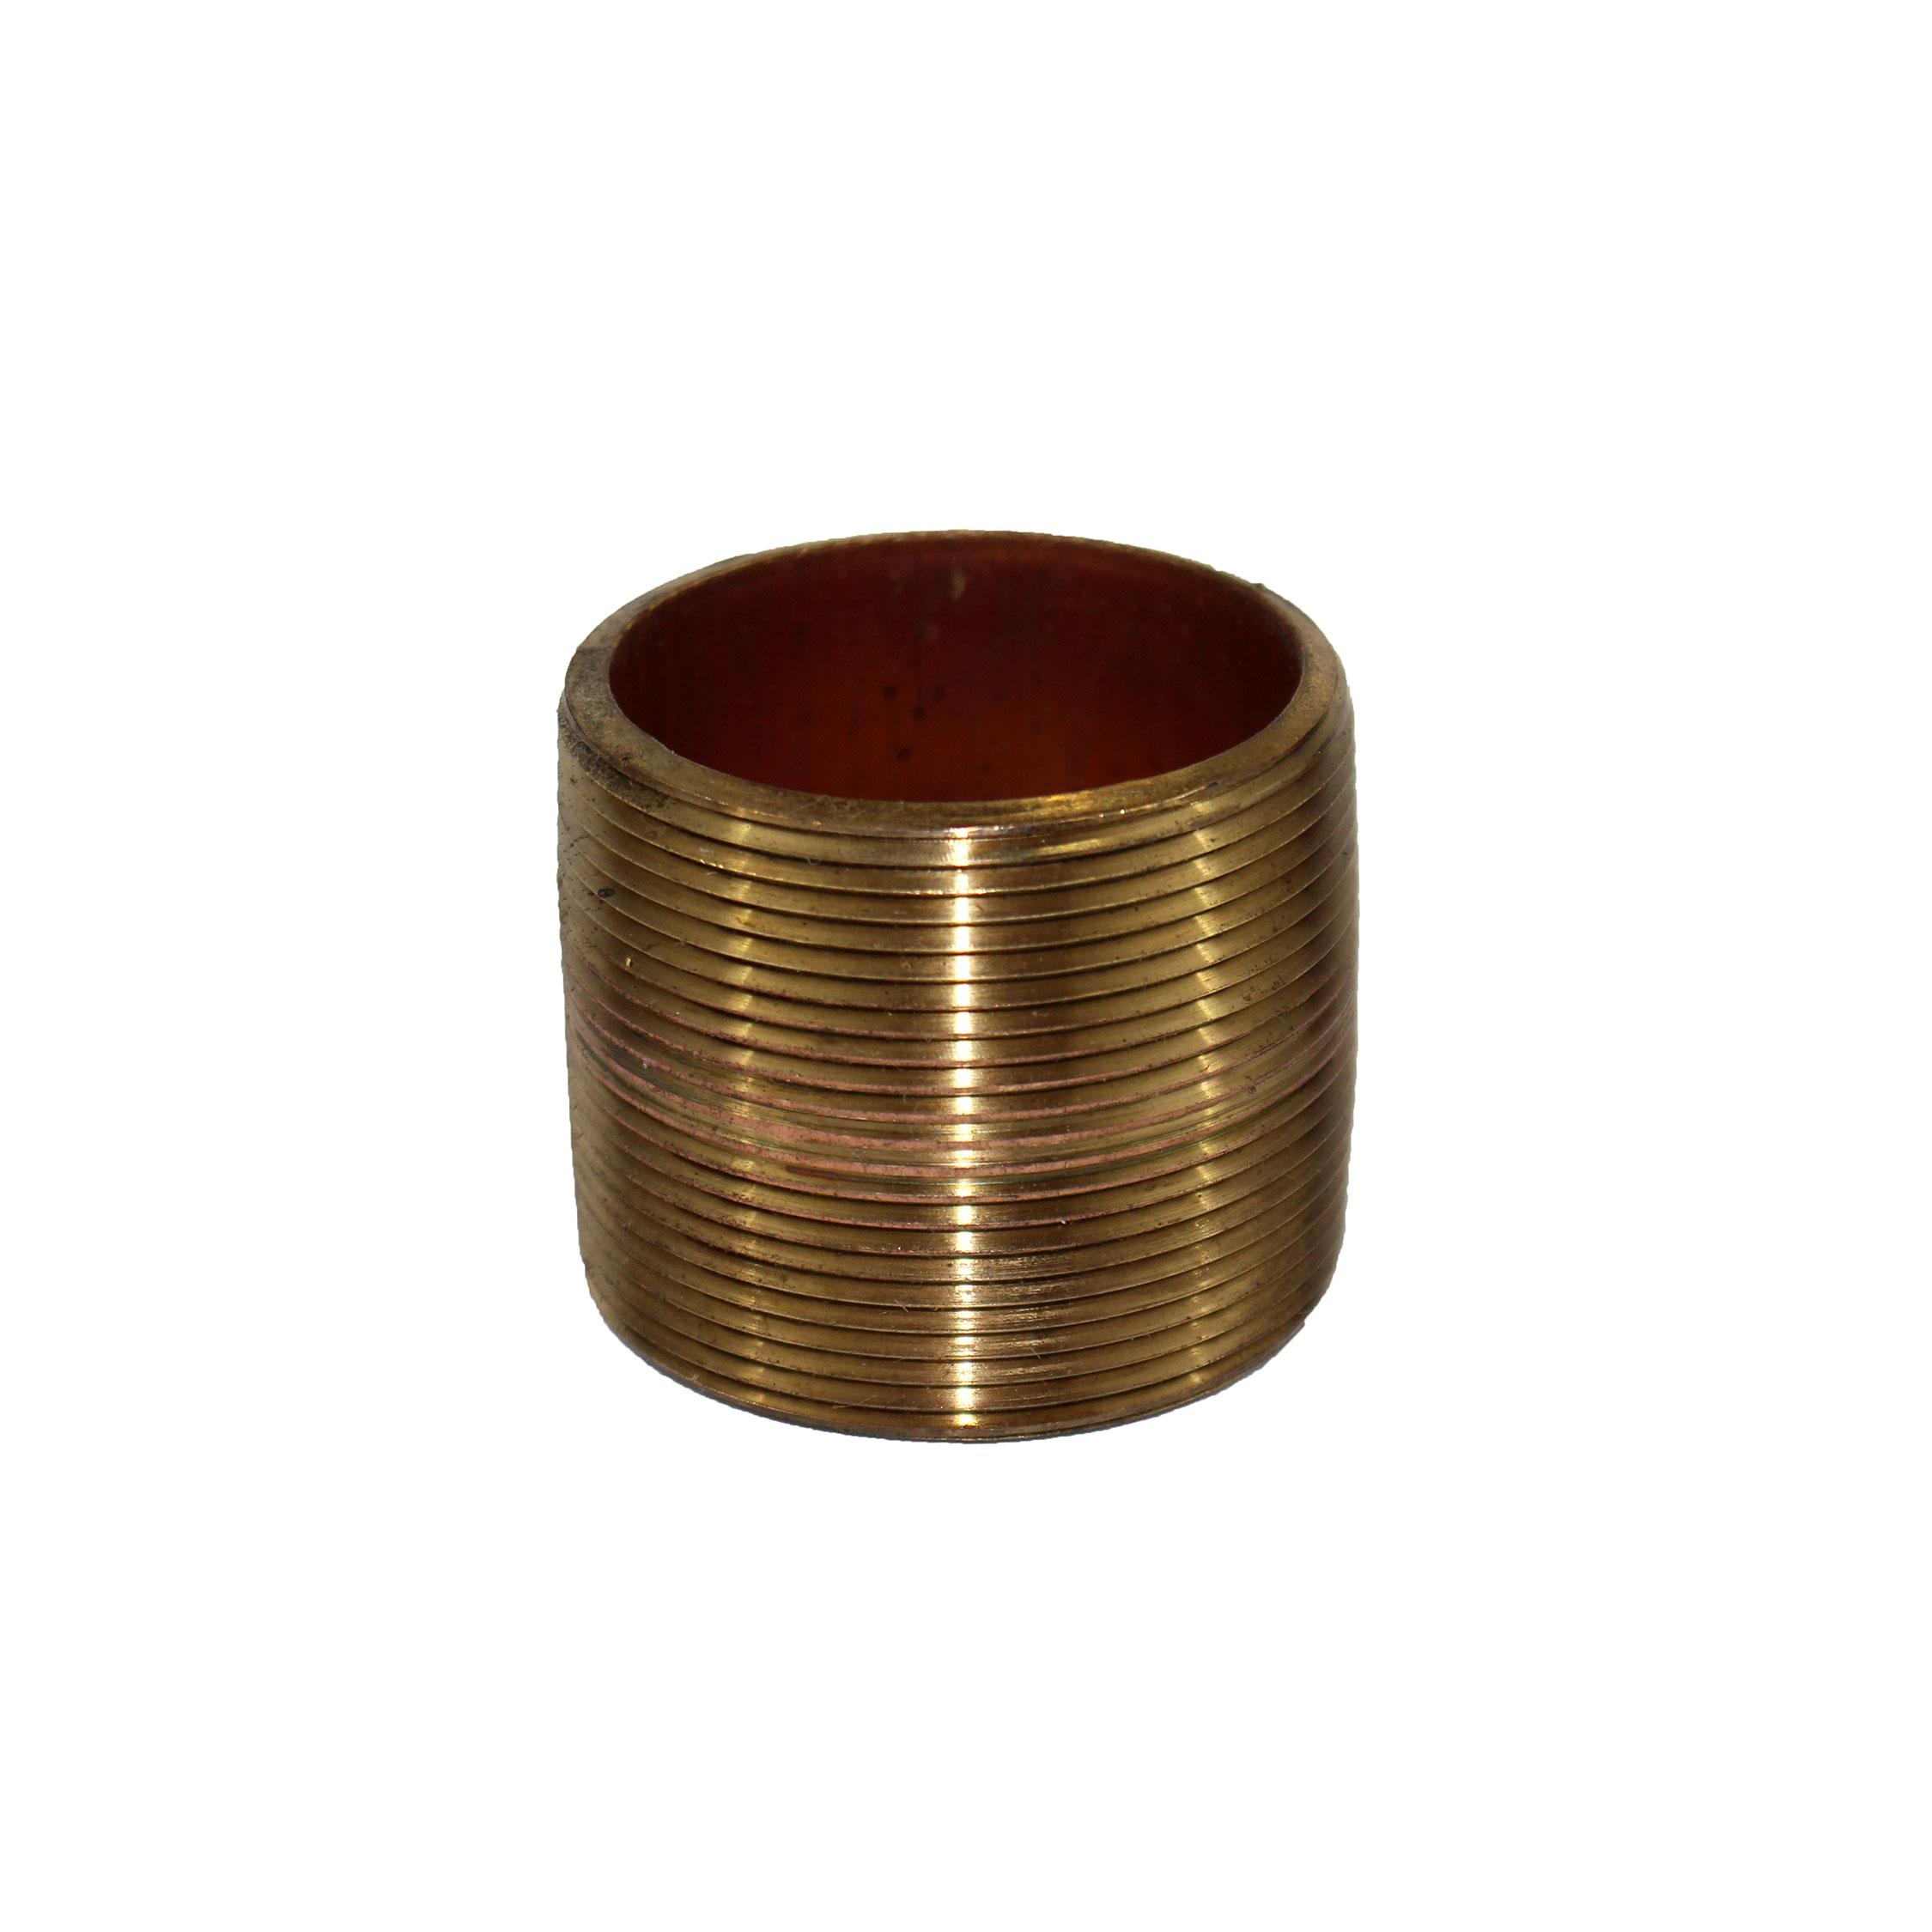 603900-Standard-Brass-Nipple-(2).jpg